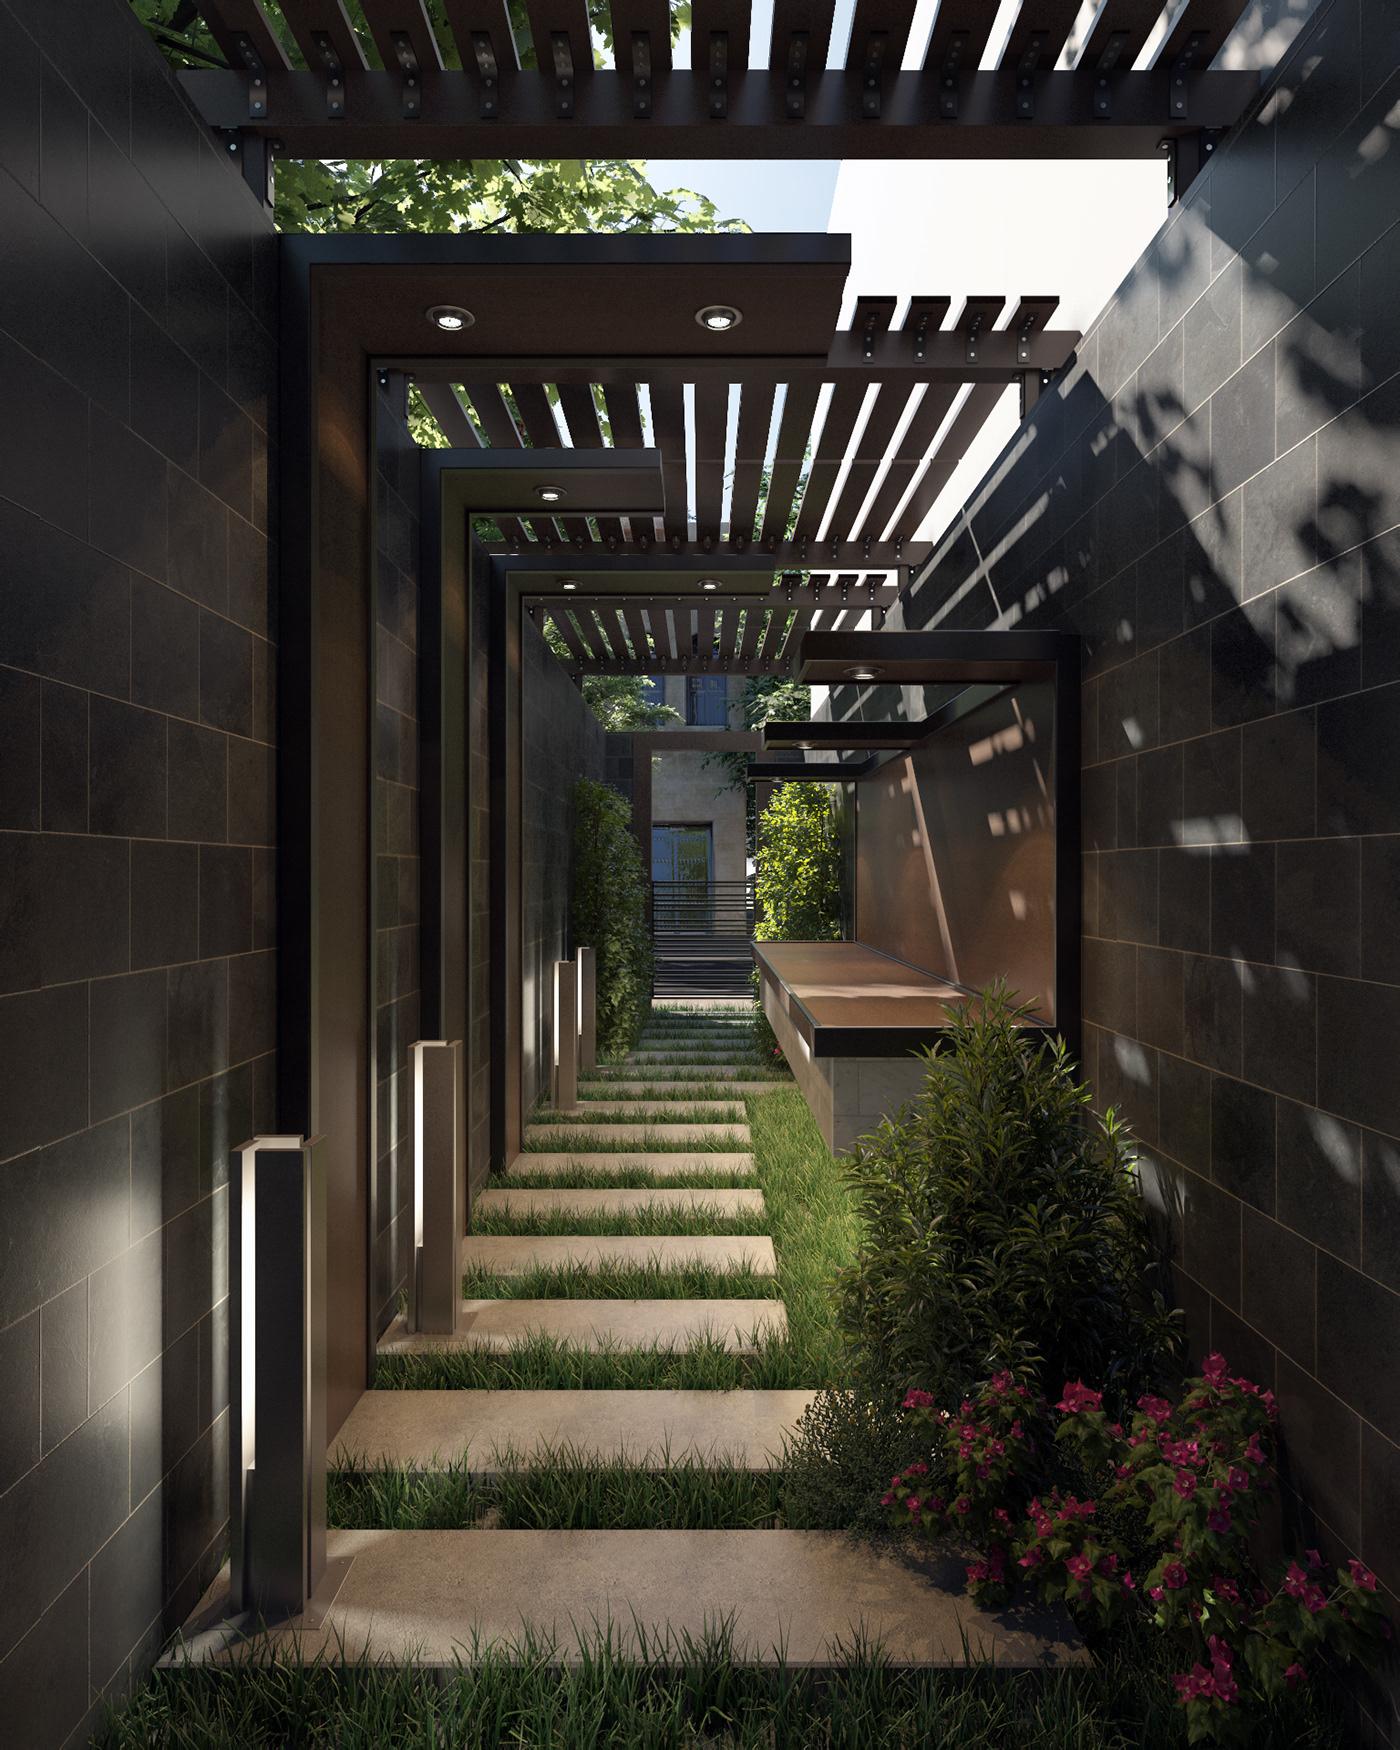 architecture design visualization 3dsmax photoshop vray creative Motaz mostafa